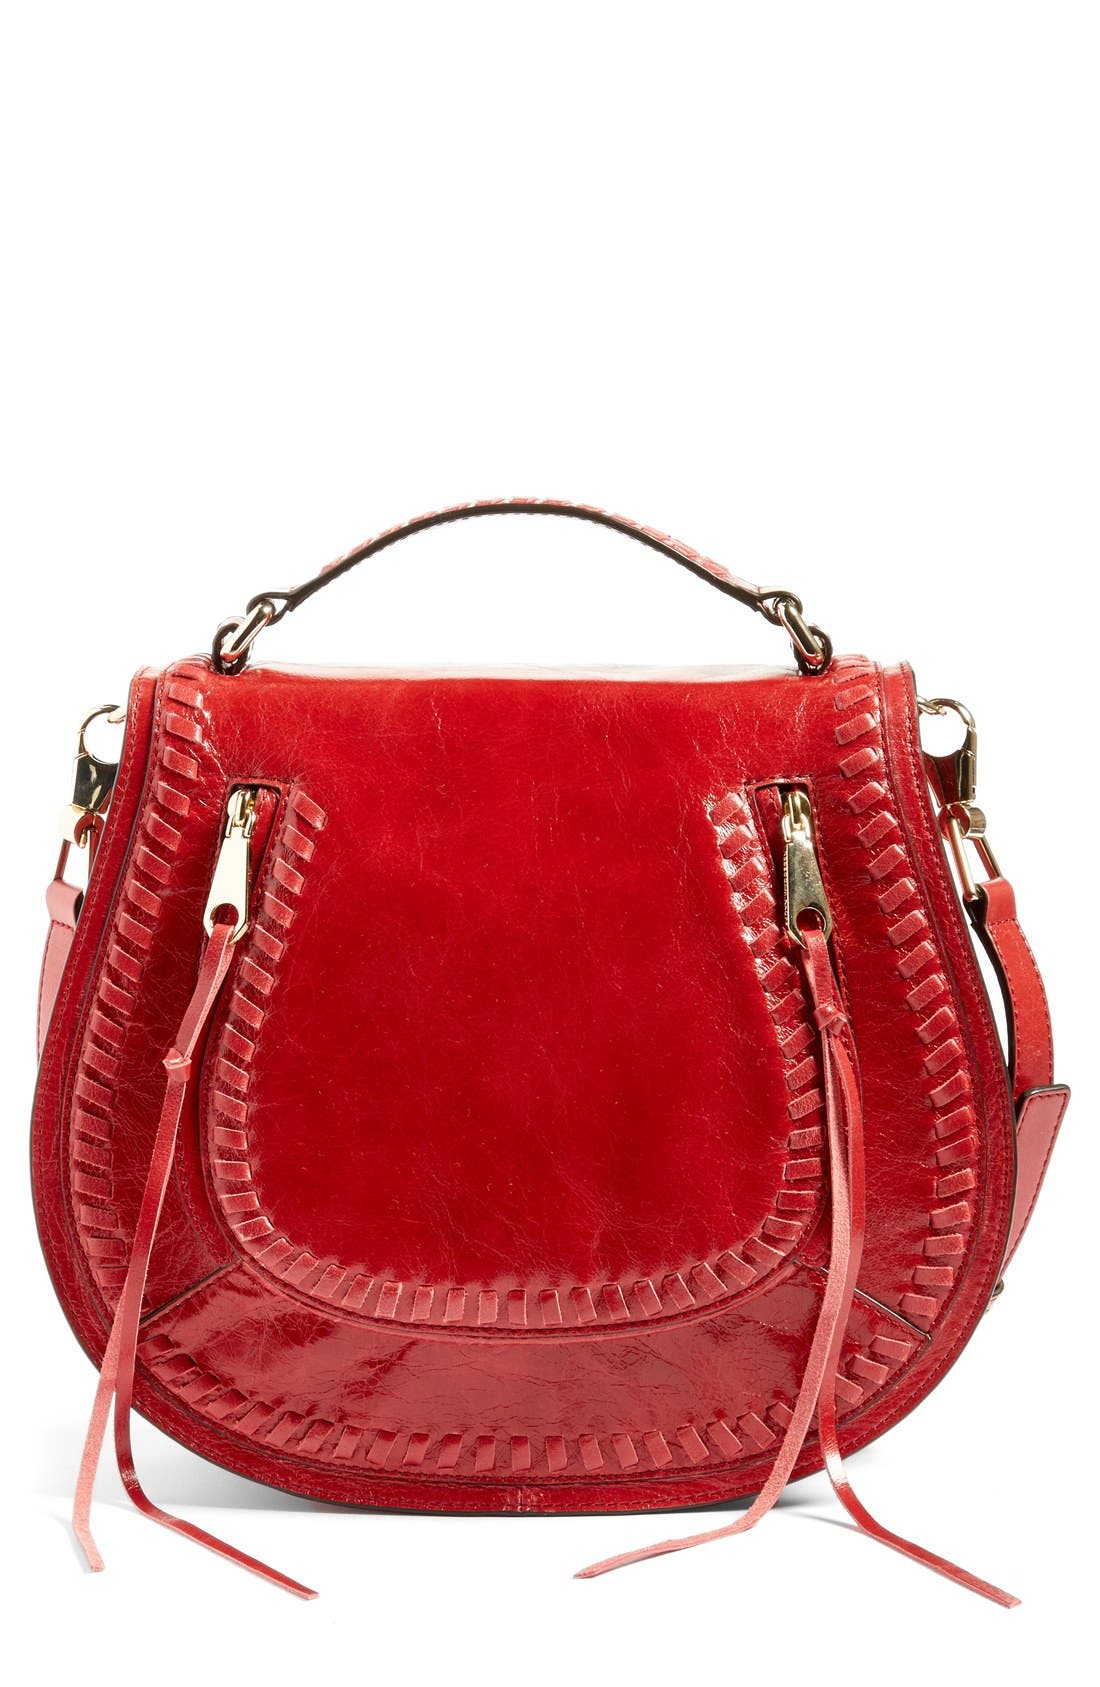 Alternate Image 1 Selected - Rebecca Minkoff Vanity Saddle Bag